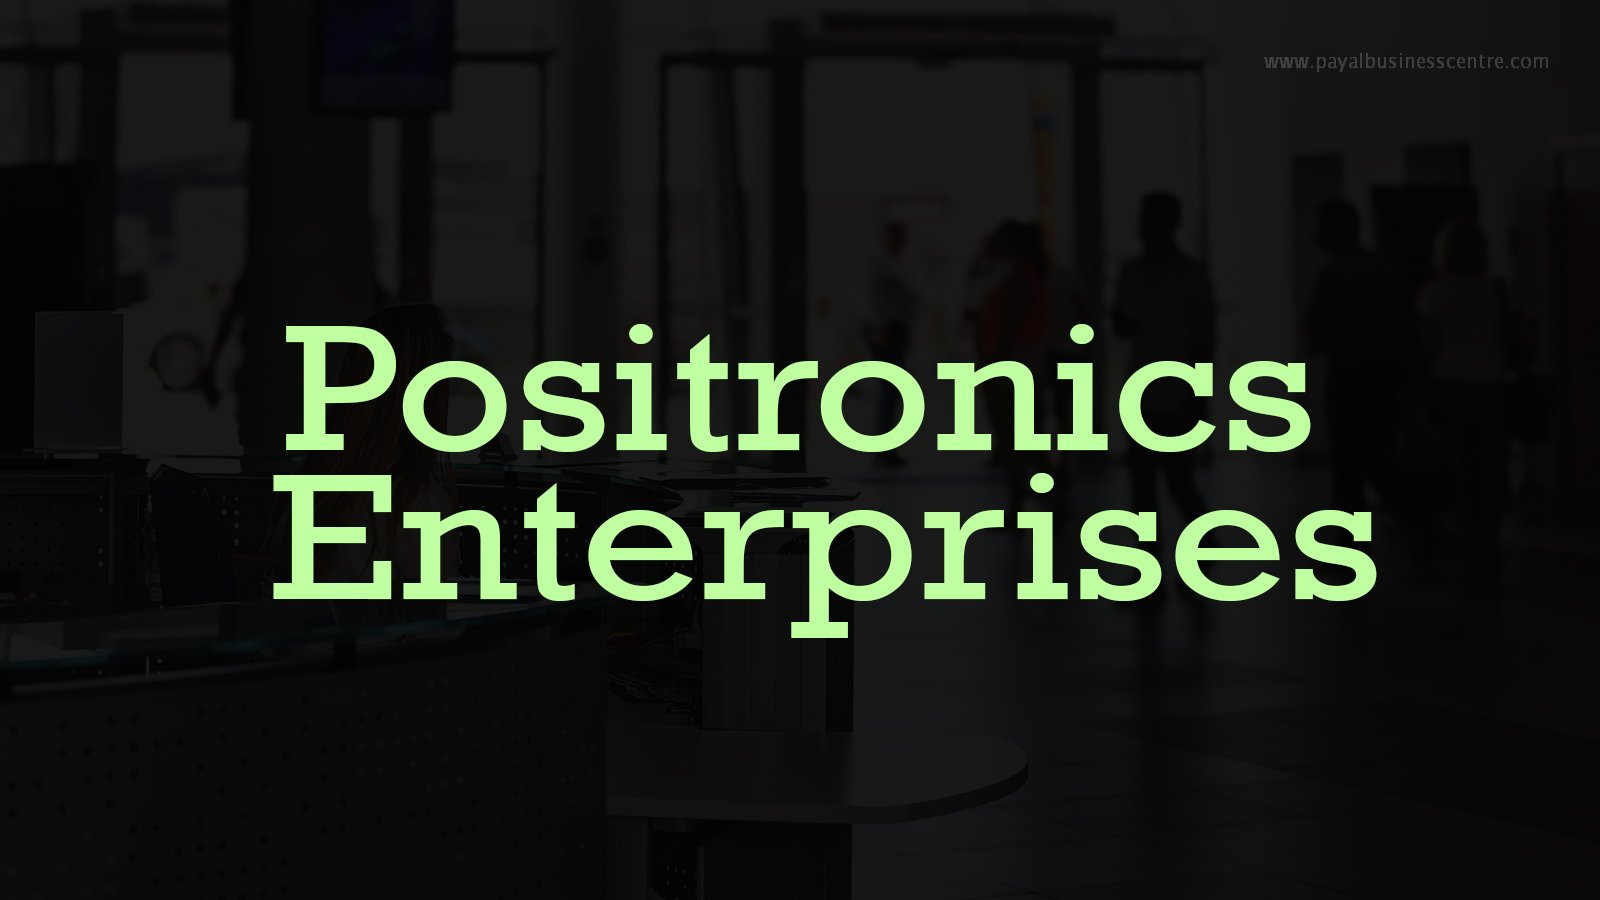 Positronics Enterprises